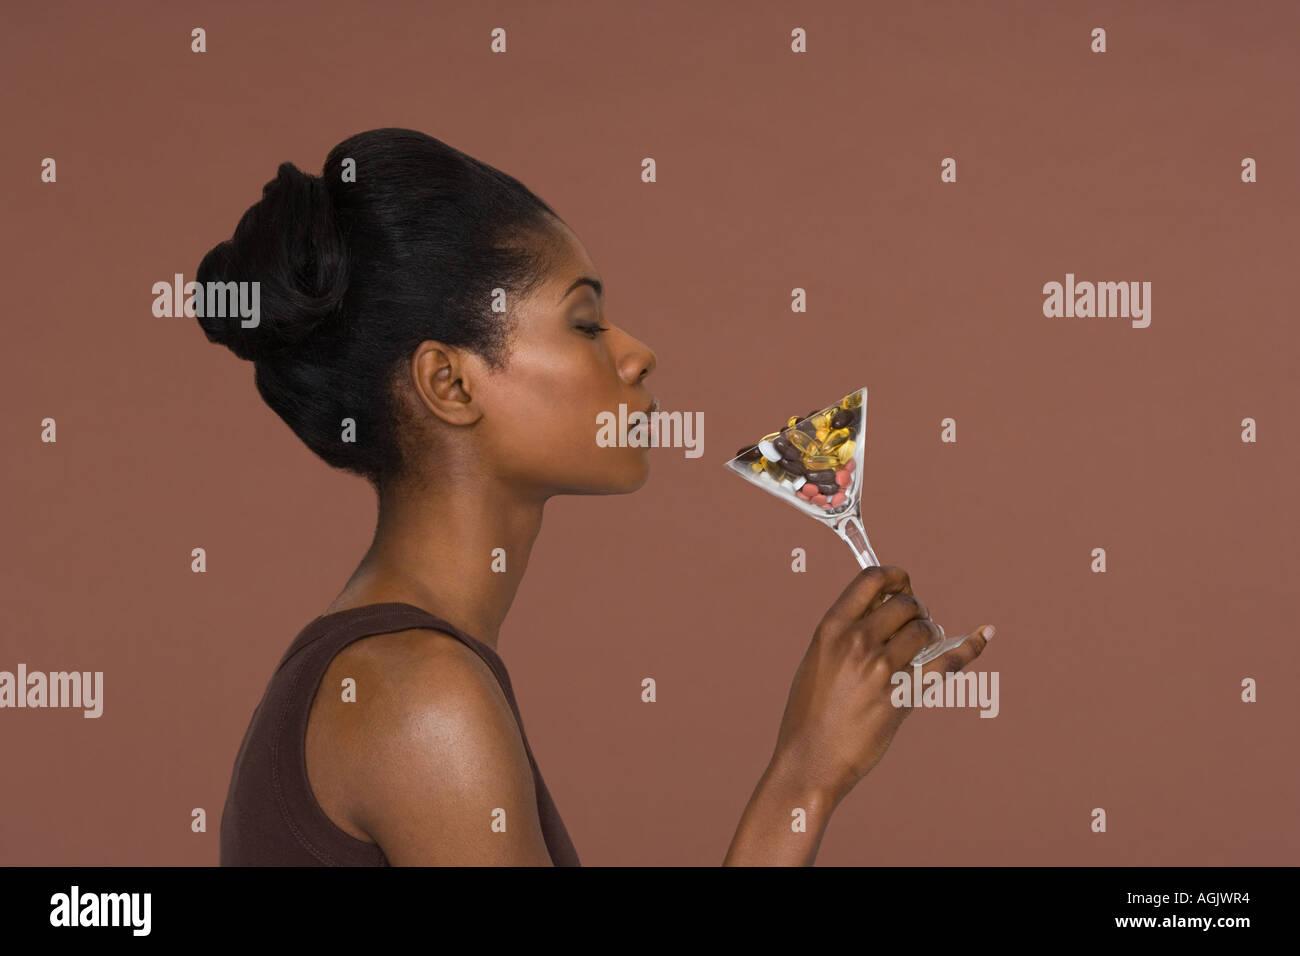 Junge Frau mit einem cocktail Glas Vitamine Stockbild